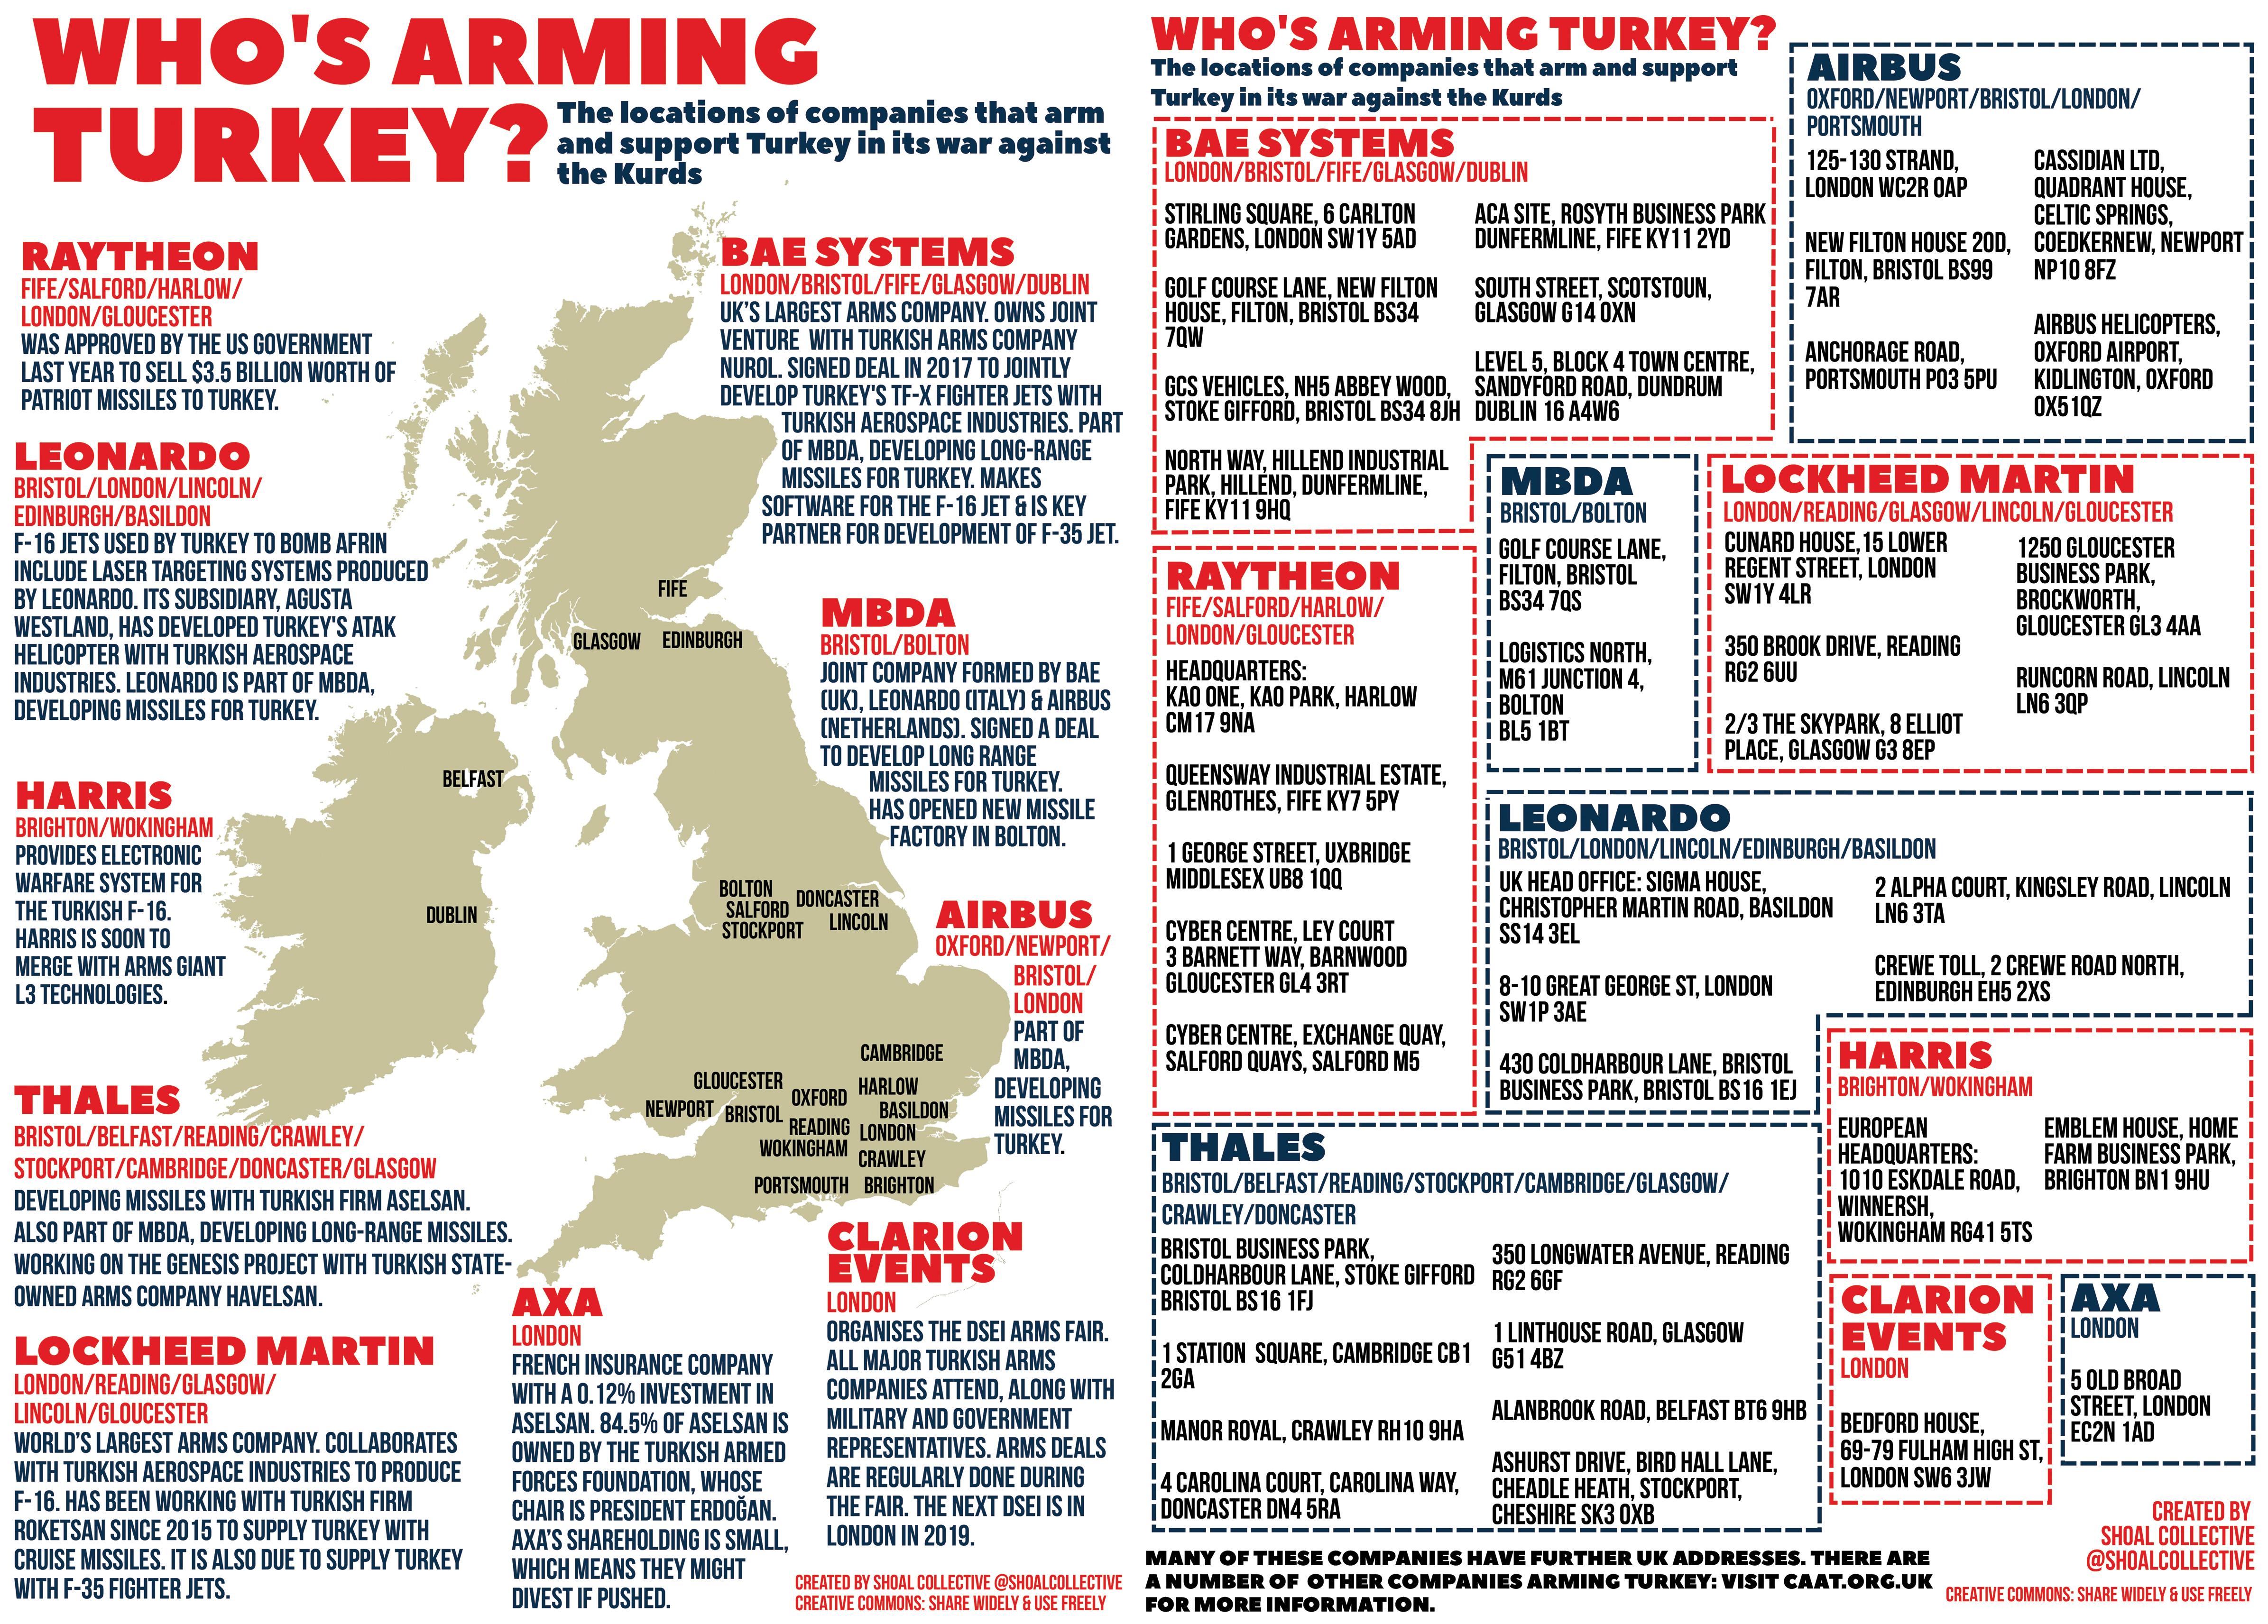 Who's Arming Turkey?